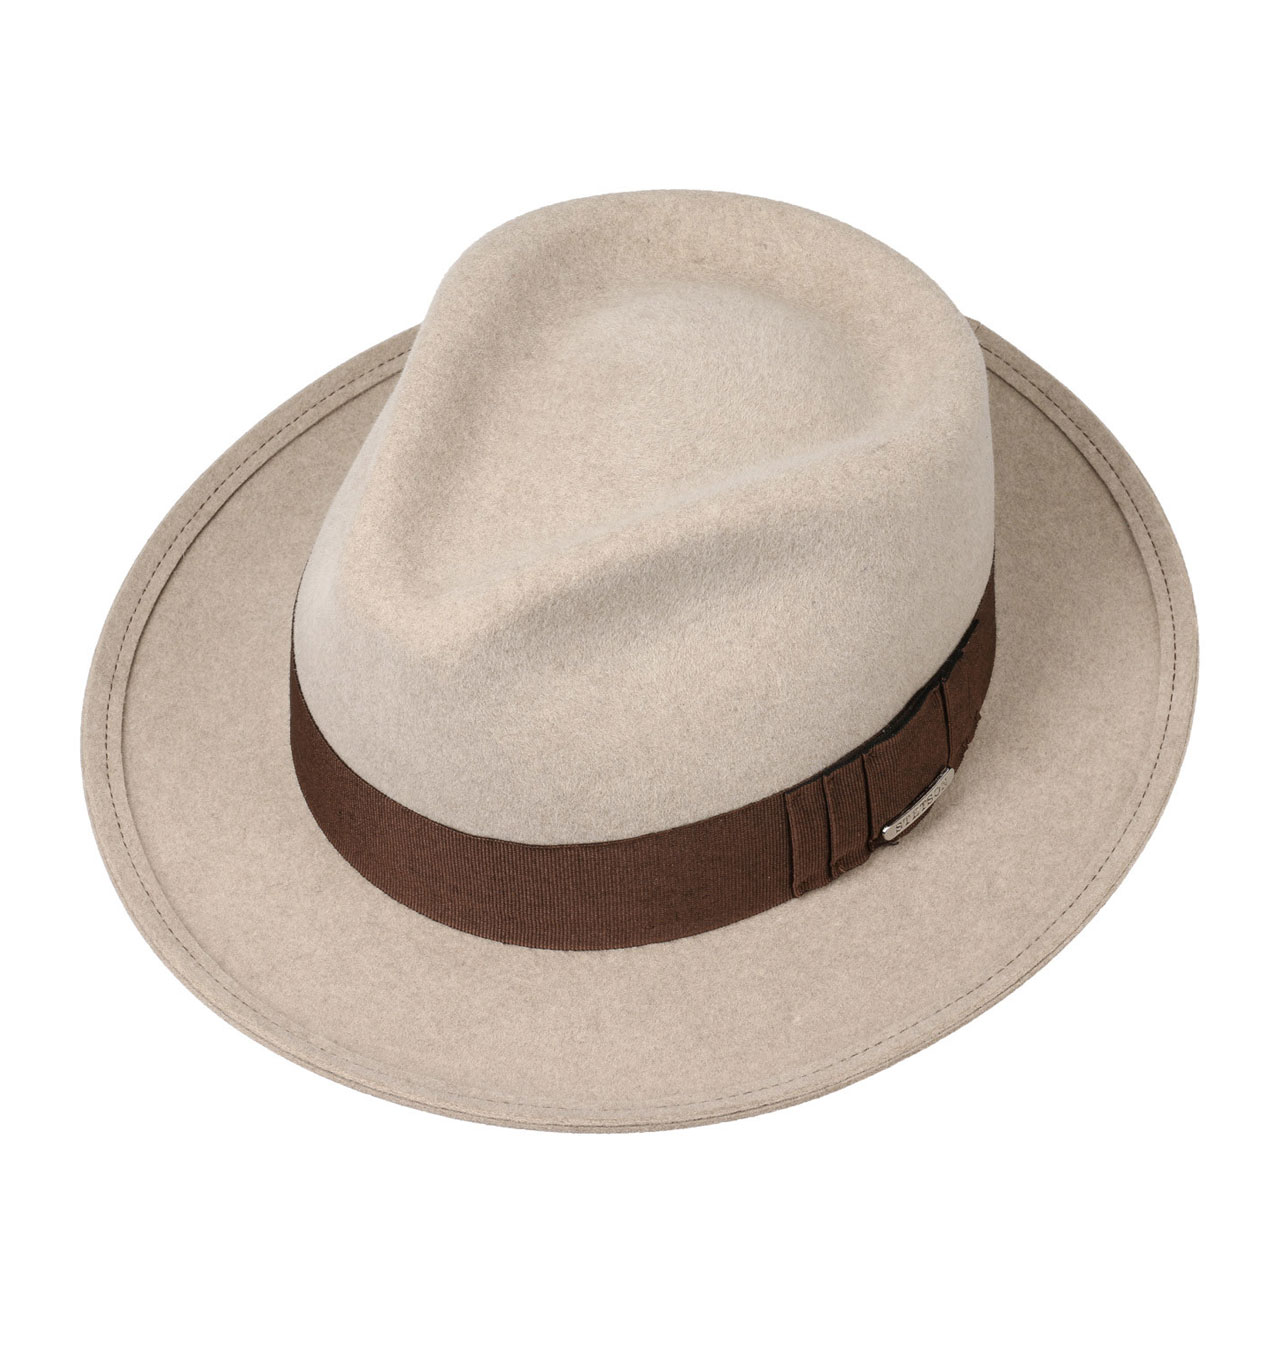 f4ecdc85764ca Stetson - New Orleans Fur Felt Fedora Hat - Oatmeal